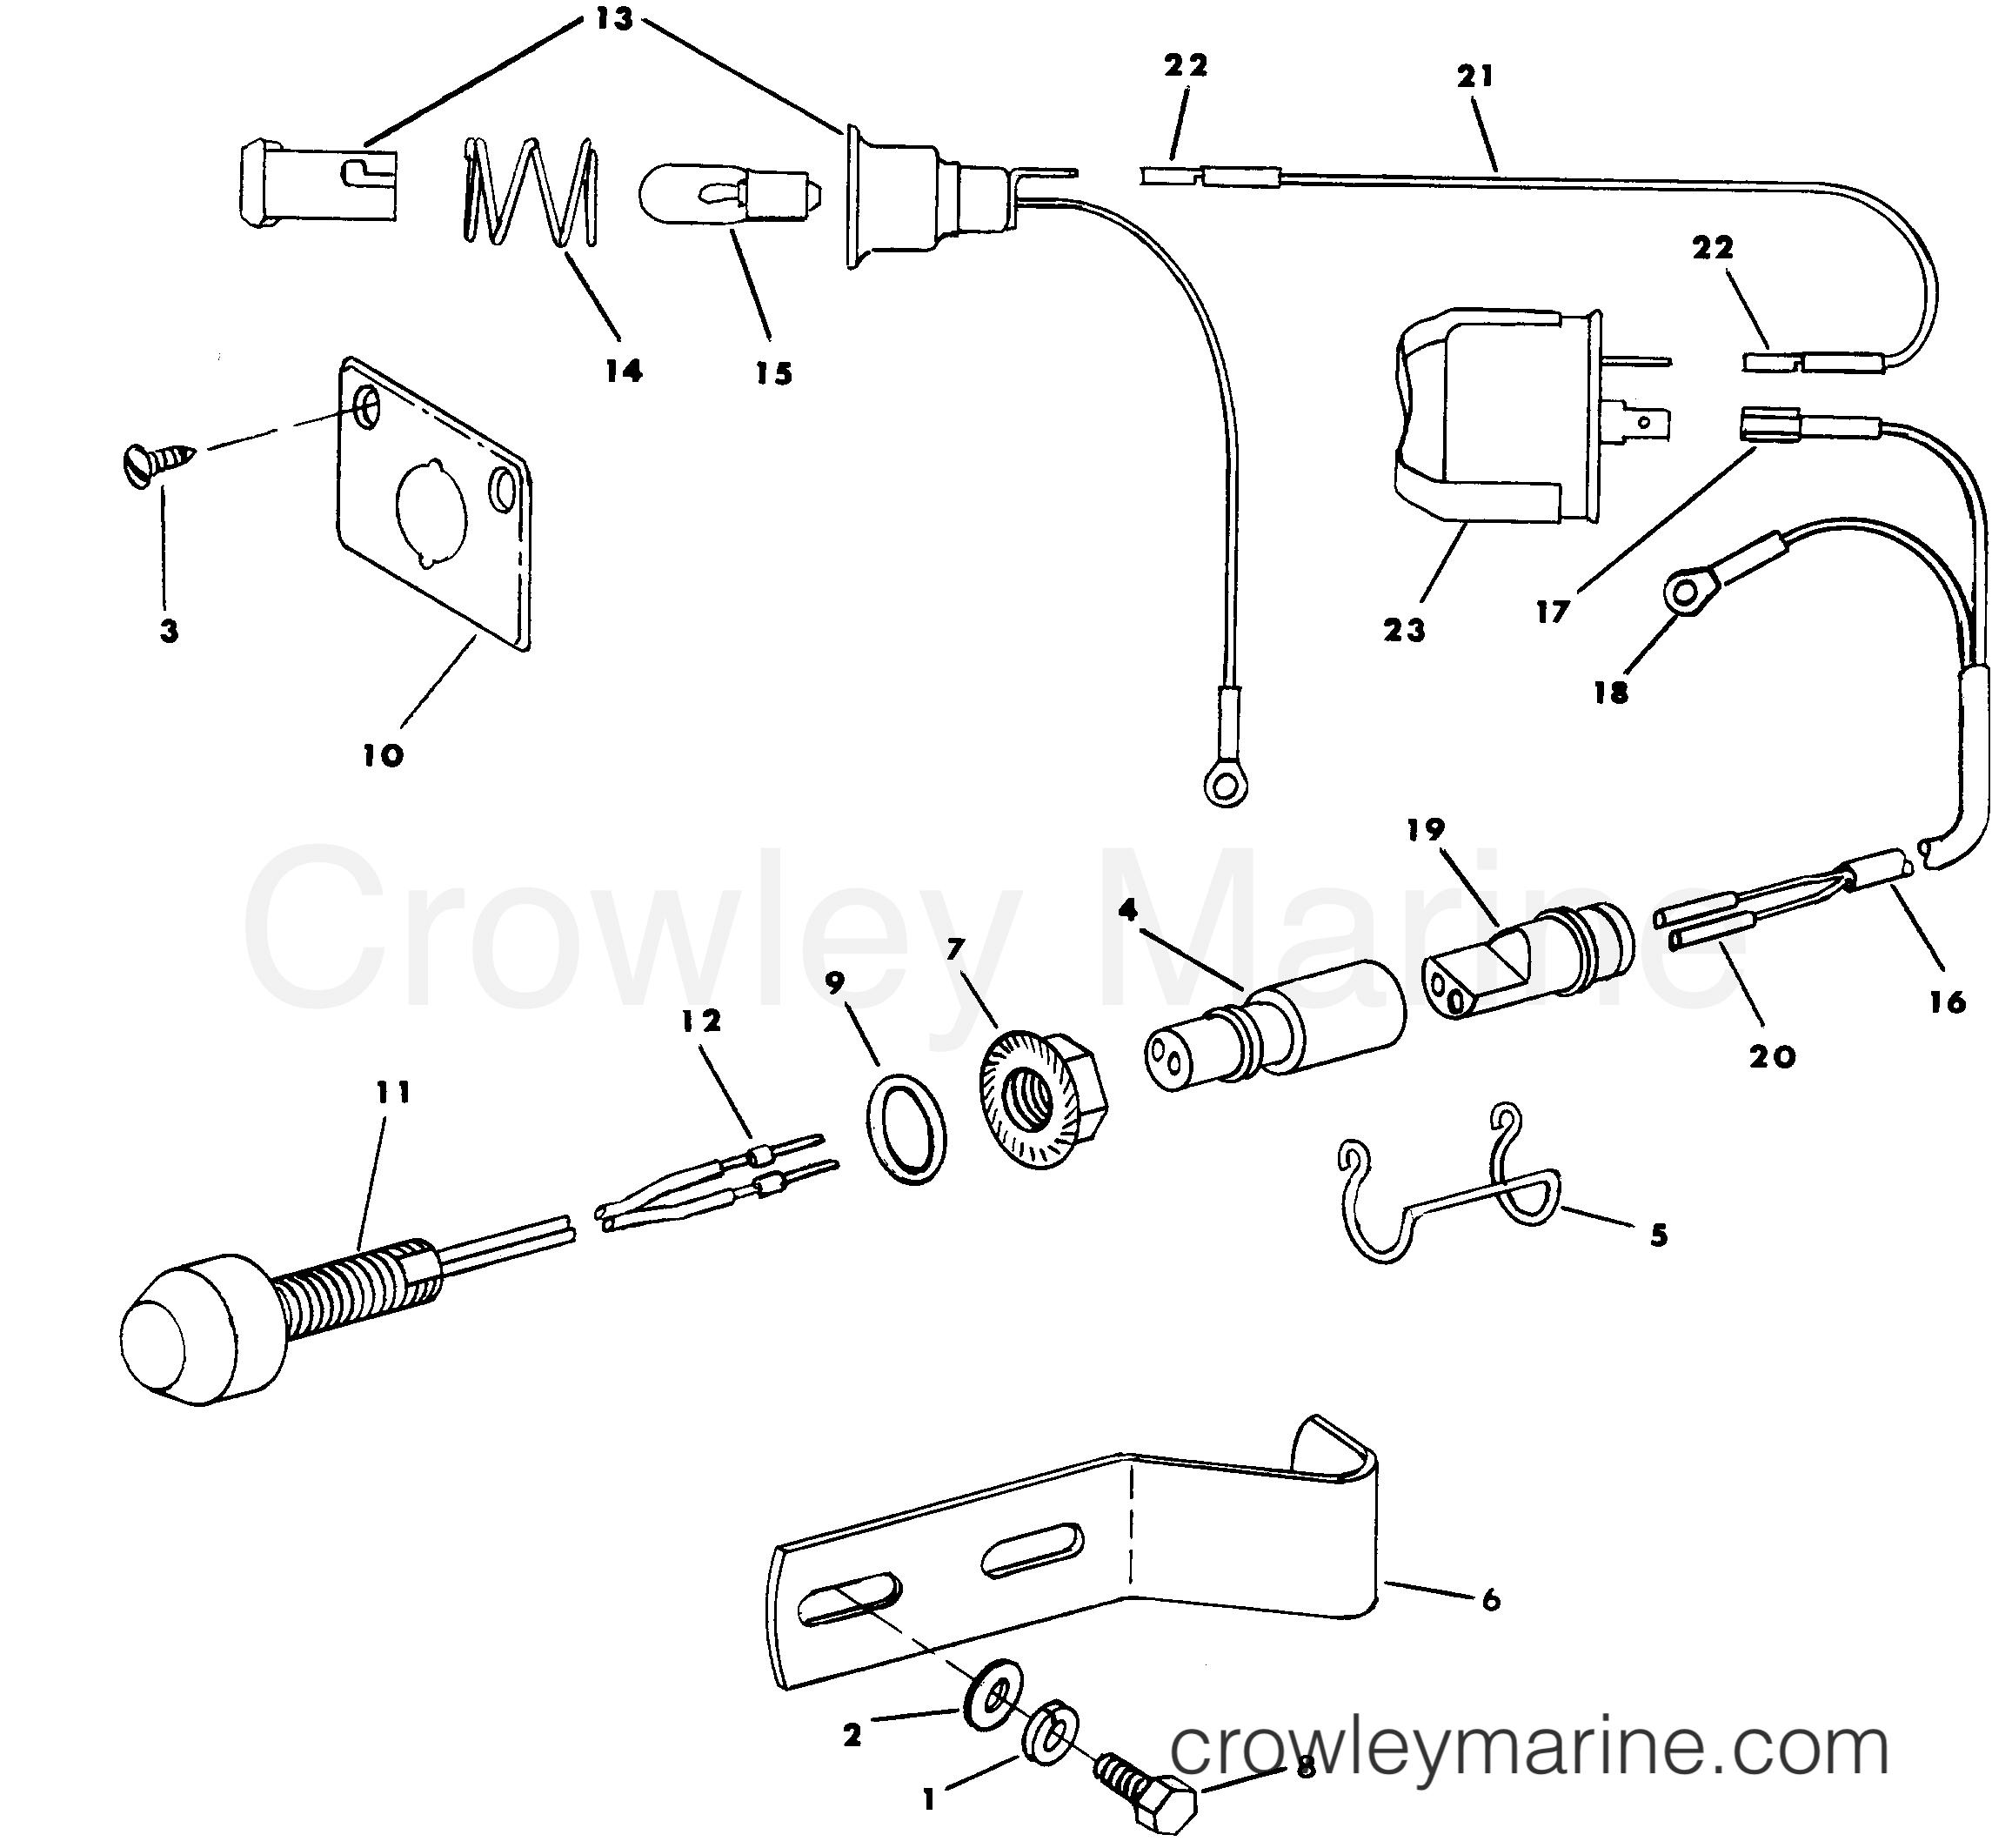 TILT WARNING KIT - 1985 Rigging Parts OMC Stern Drive All Models